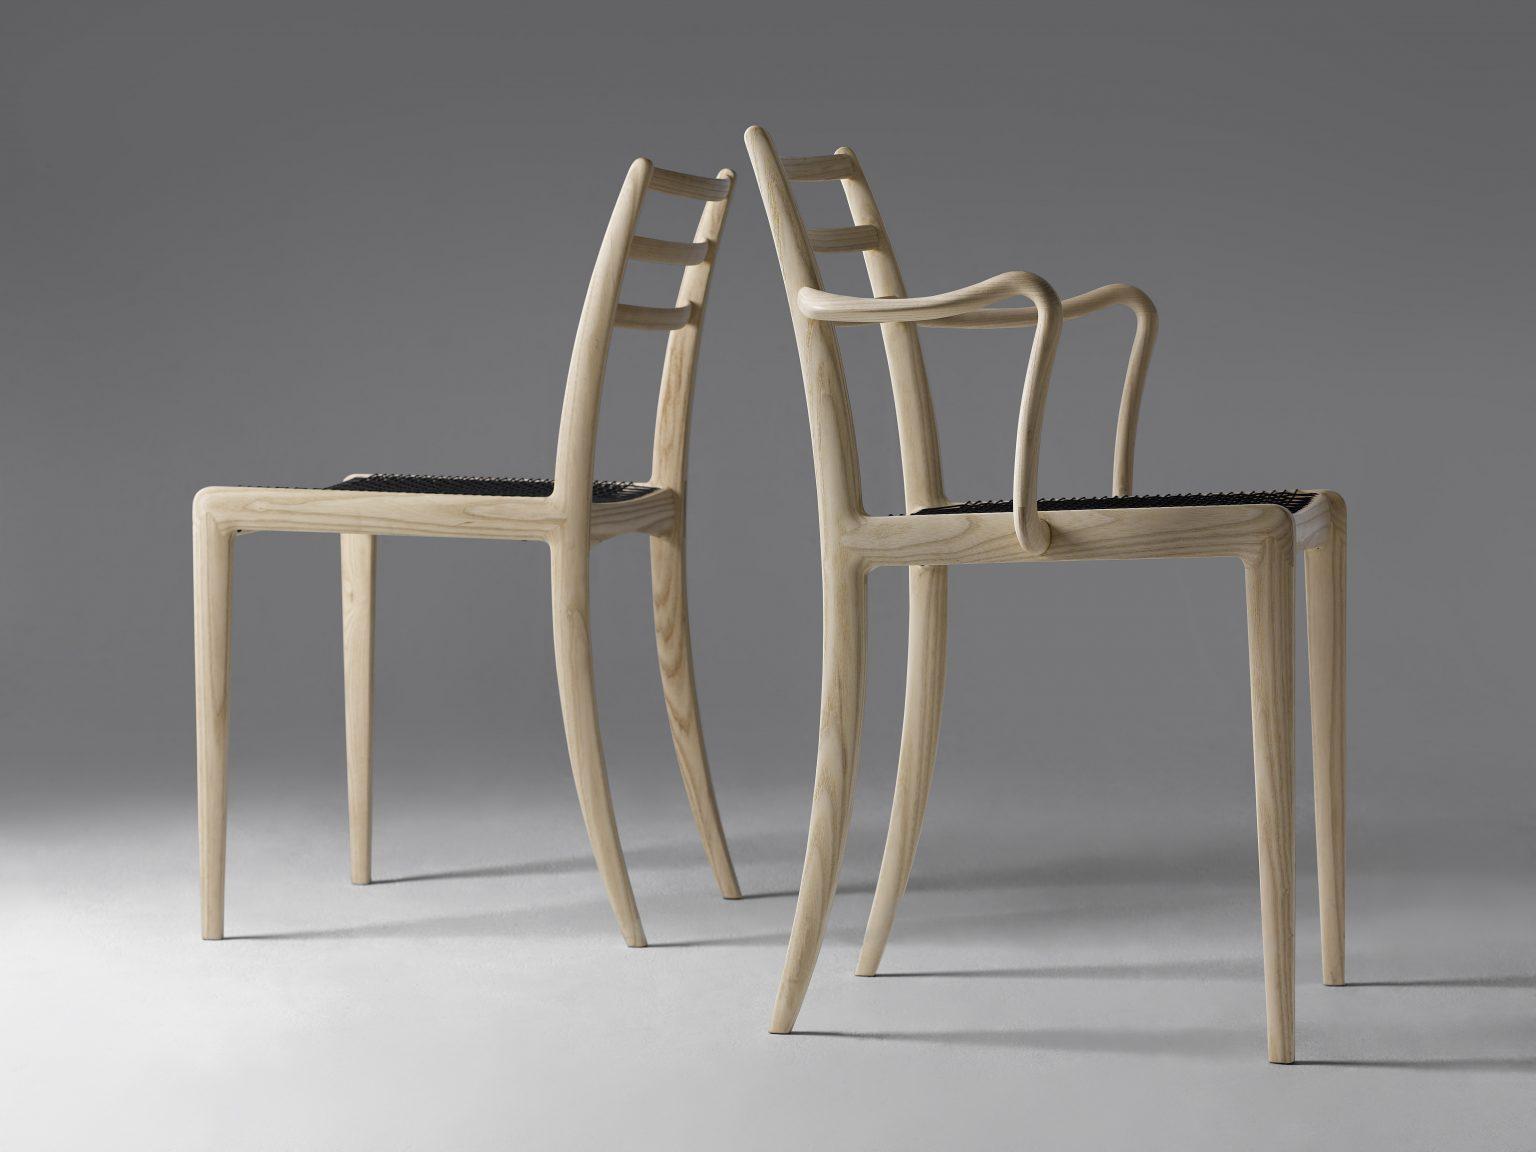 Biennale Interieur - Belgium's leading design and interior event - 20-kg-elegance-design-hans-sandgren-jakobsen-1.jpg